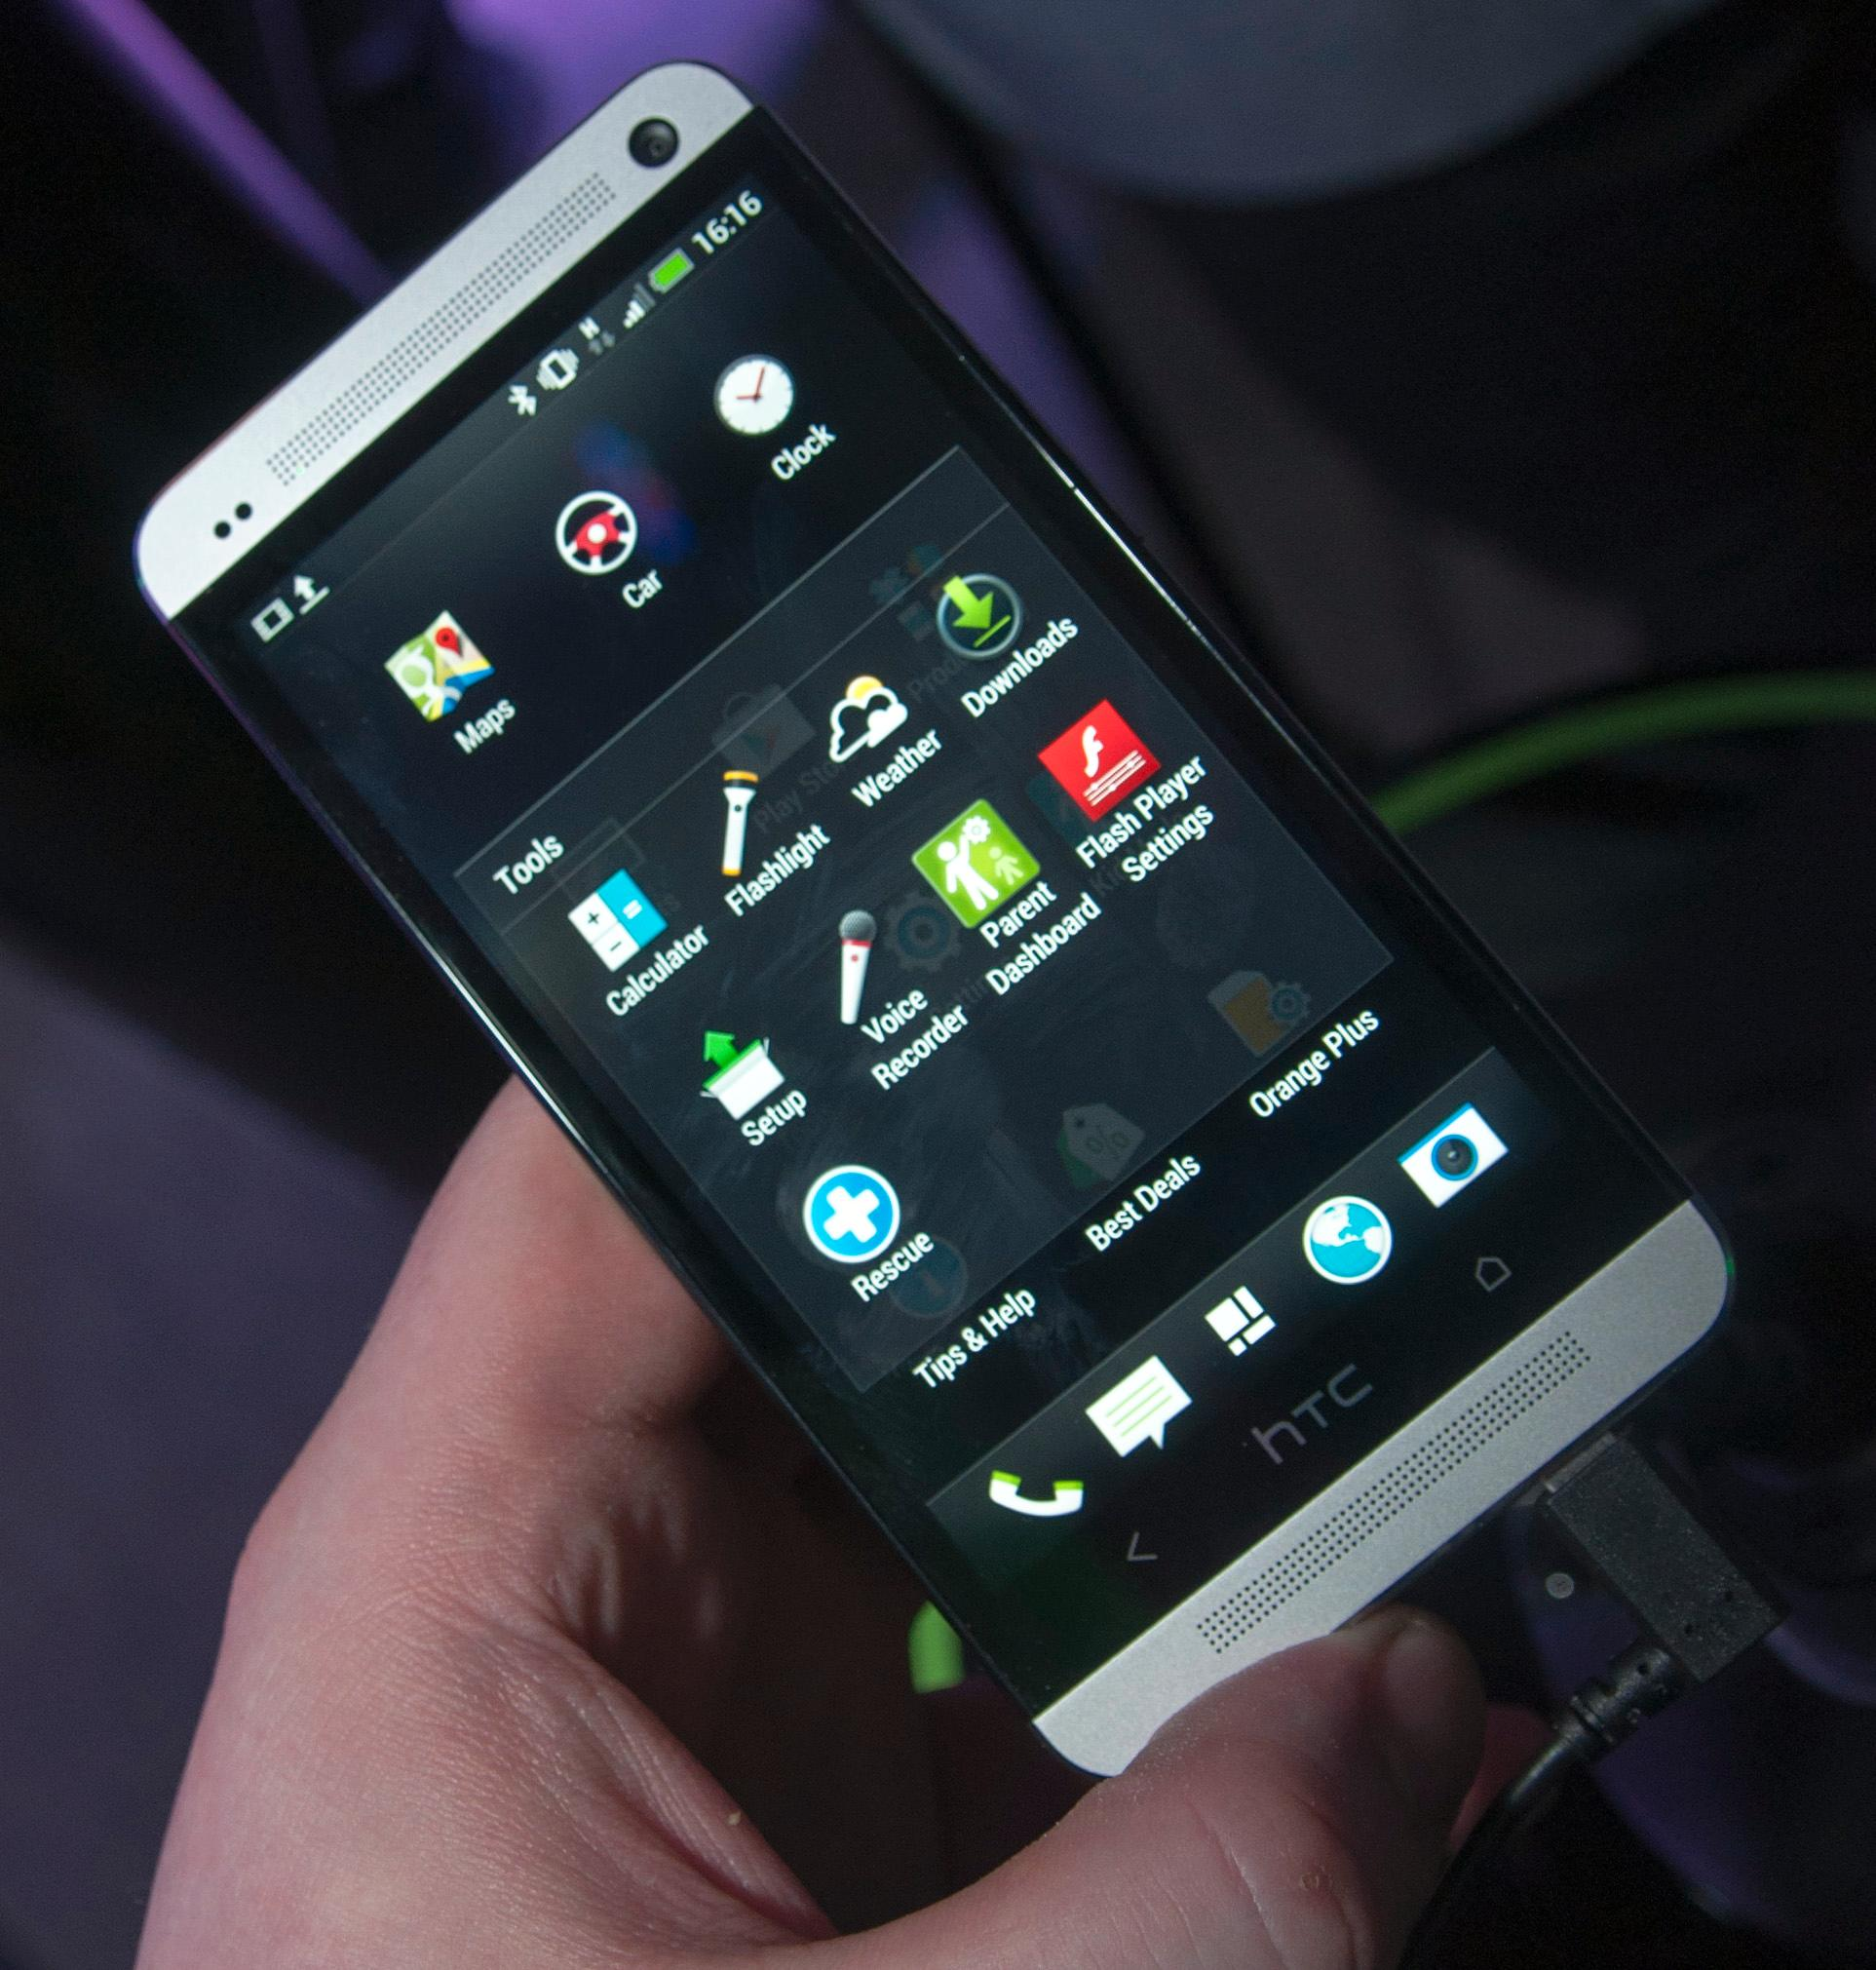 Foldere slik de ser ut i Sense 5 på HTC One.Foto: Finn Jarle Kvalheim, Amobil.no